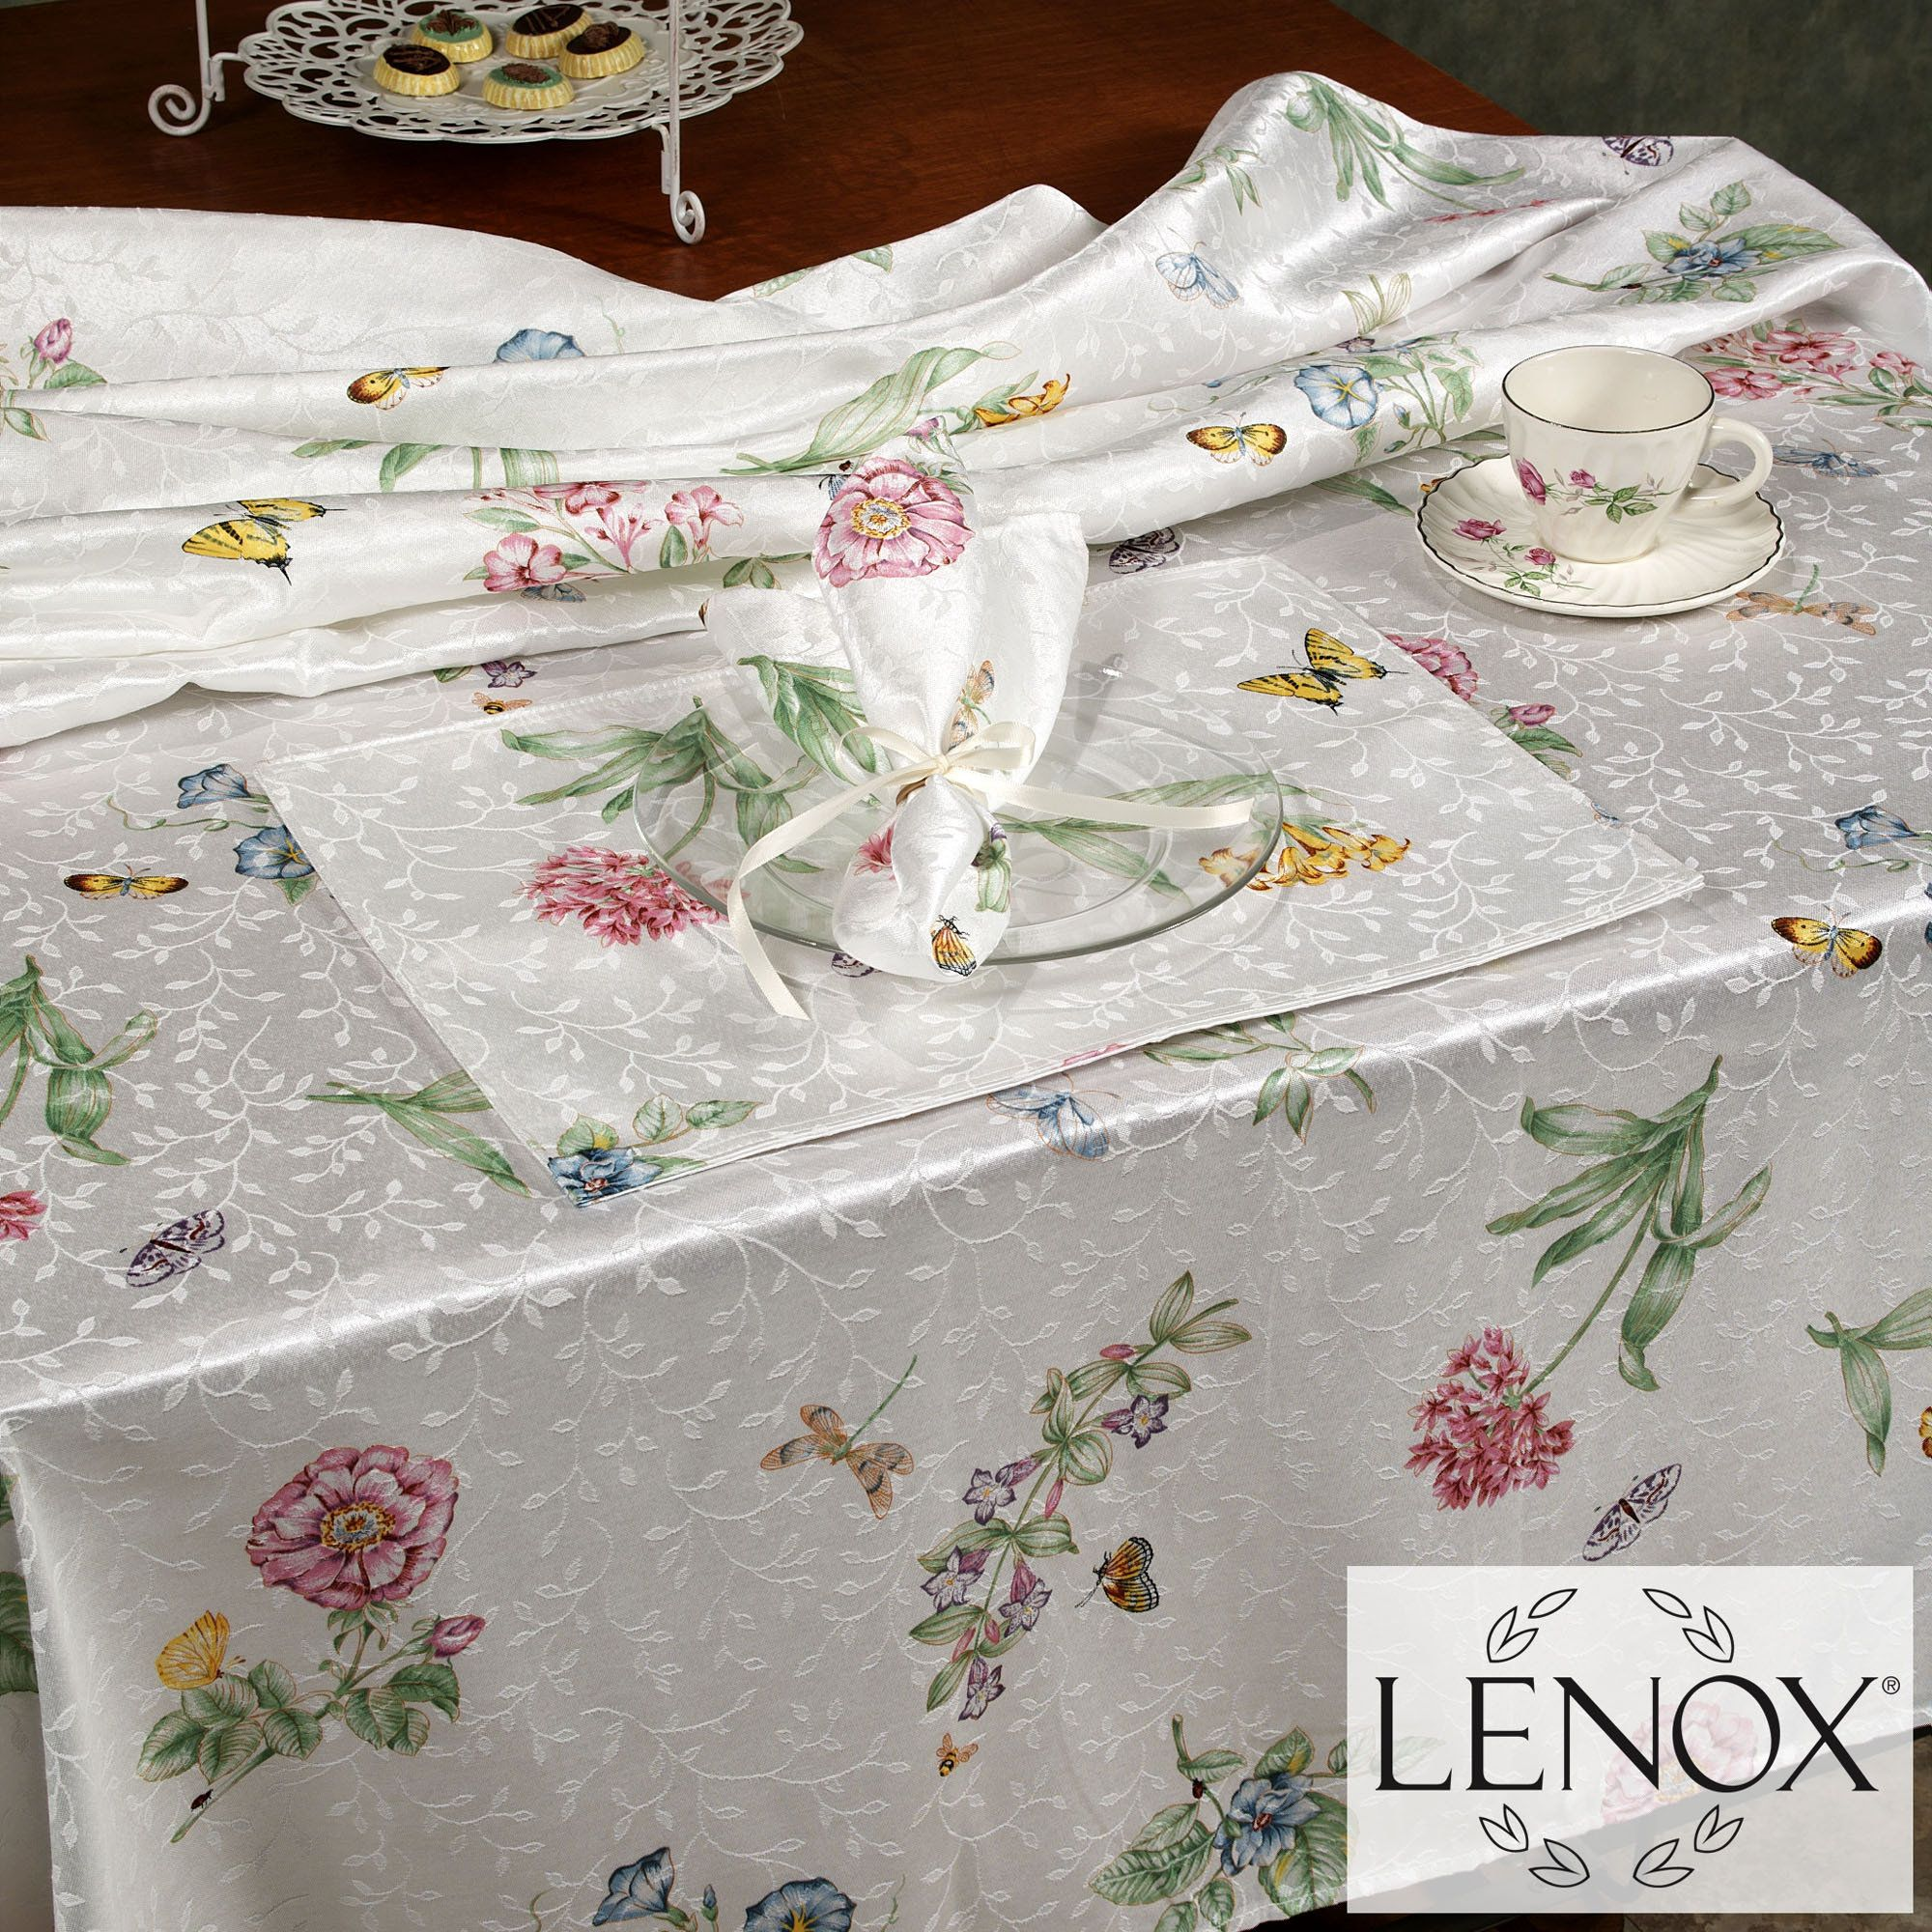 Lenox Butterfly Meadow Floral Table Linens Lenox Butterfly